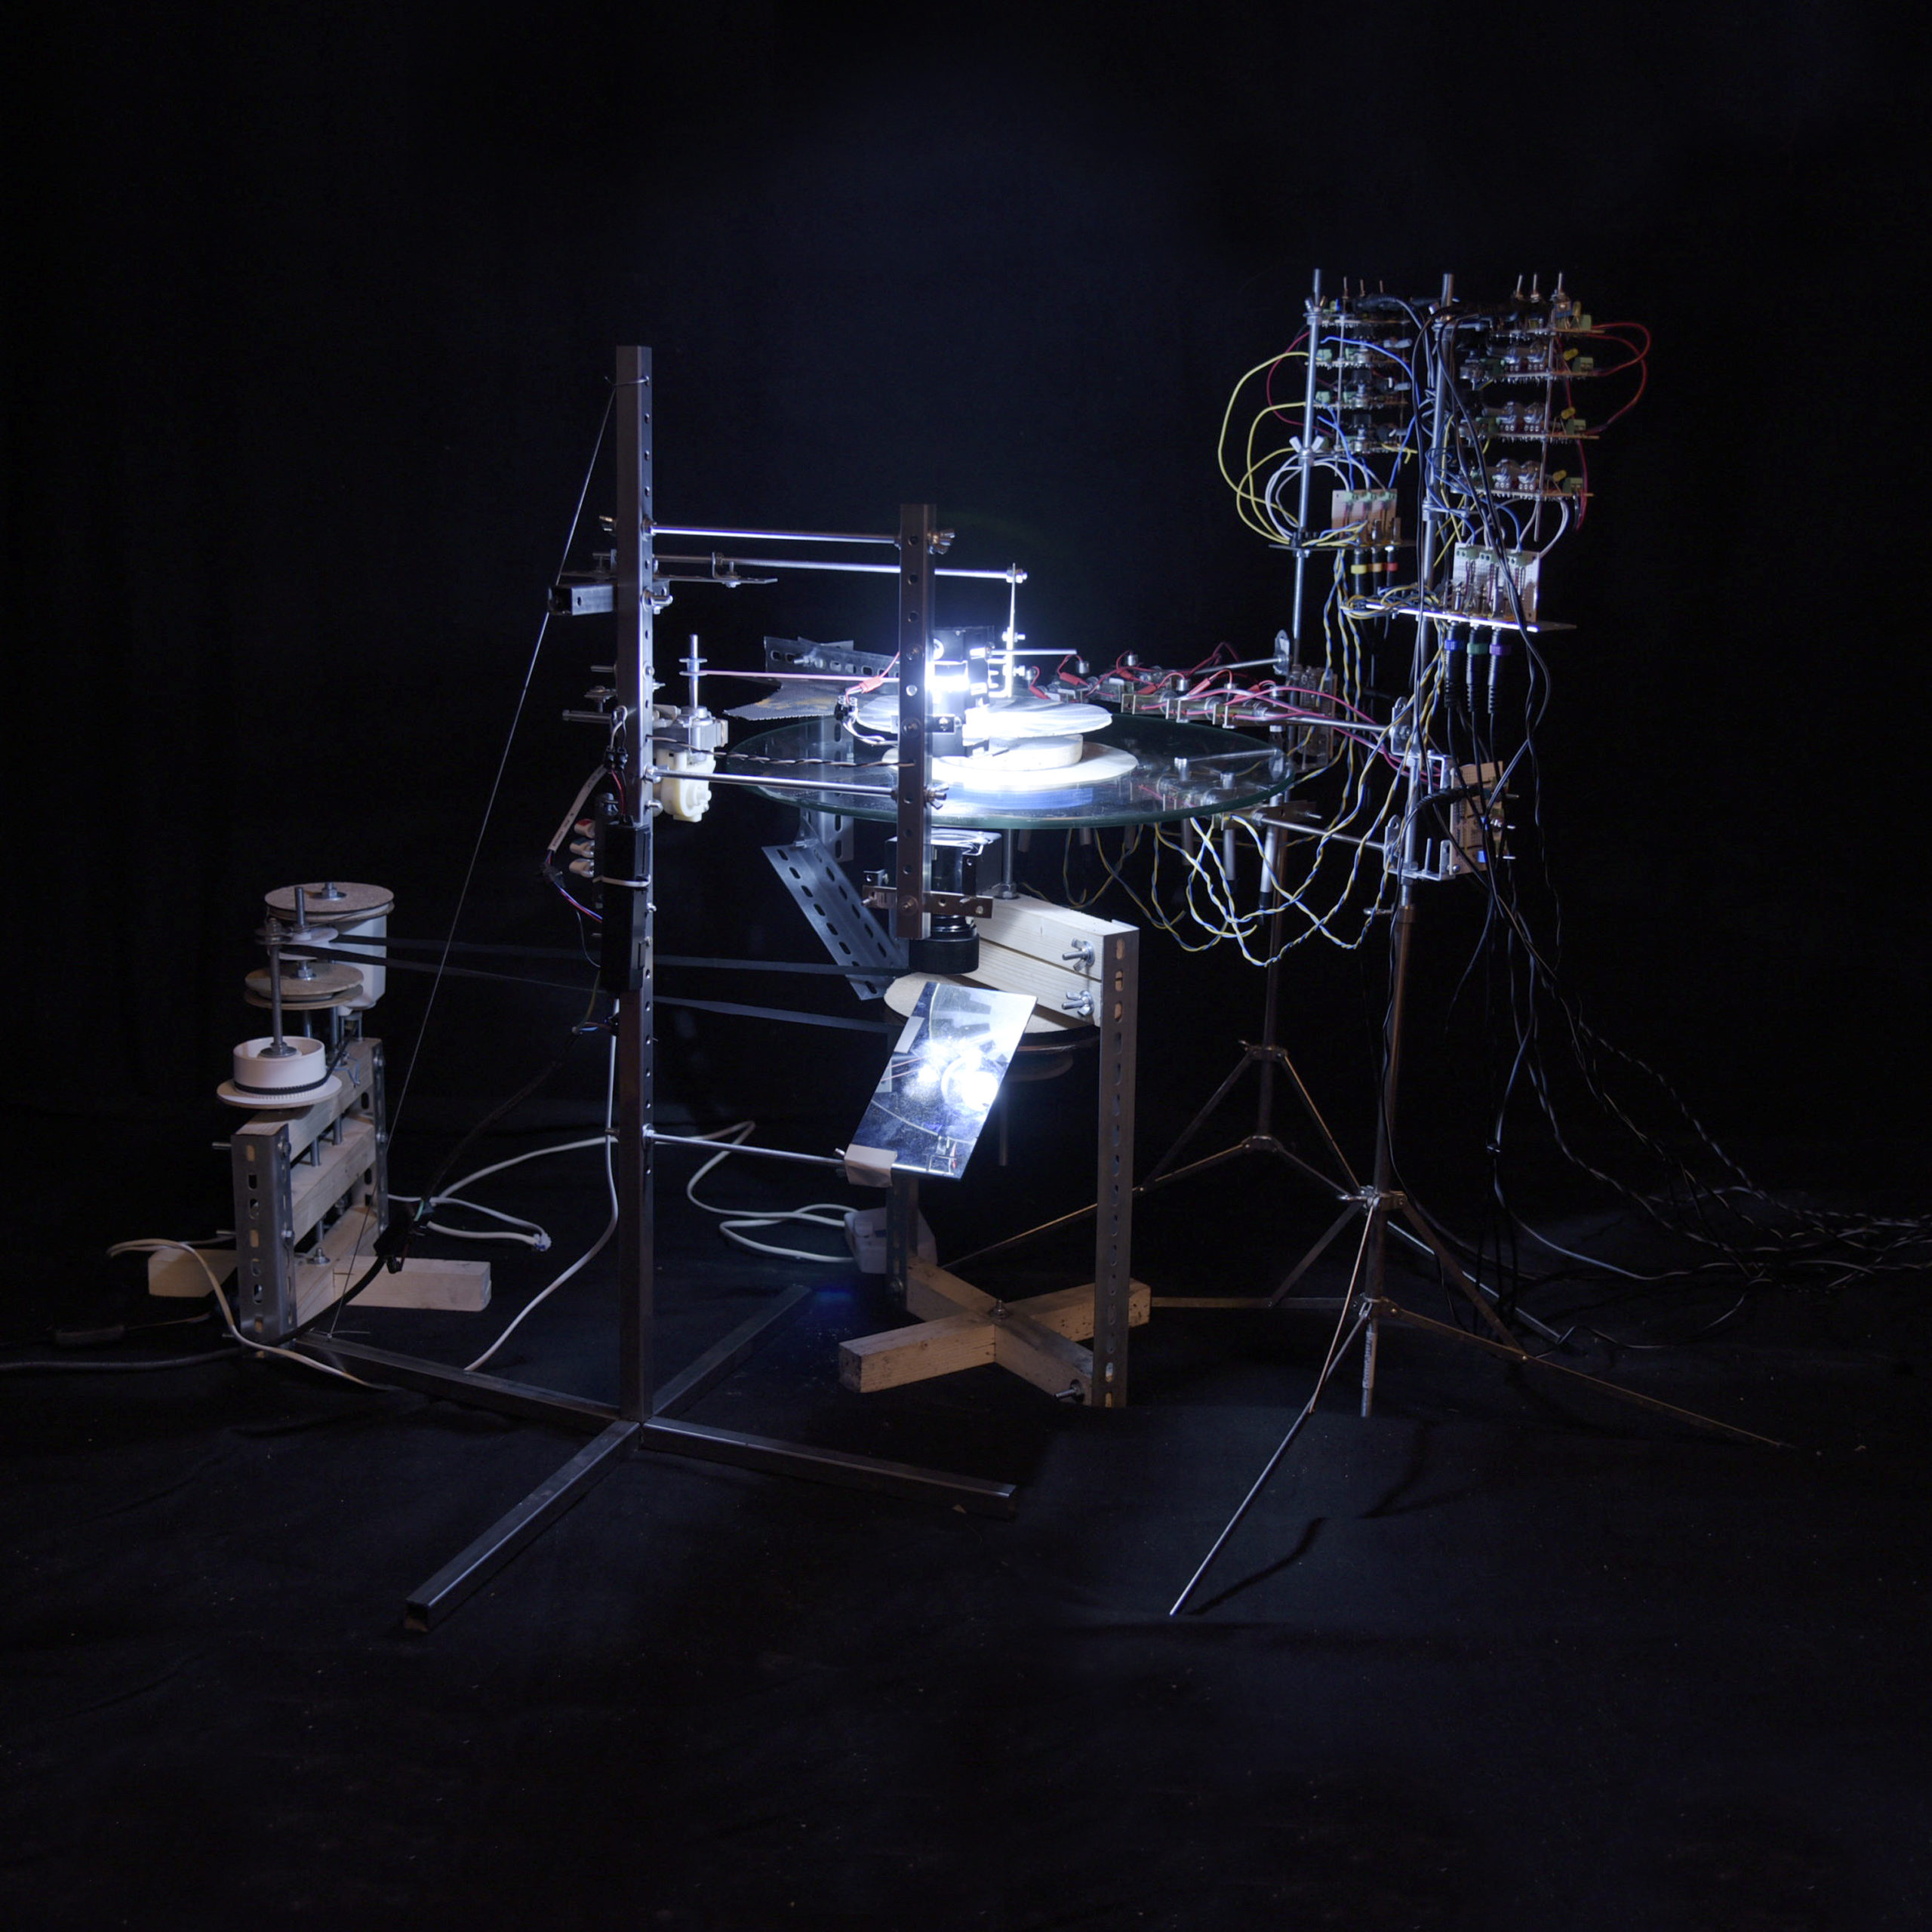 01_stations_cinetiques_diffusion_2020 @ Basile Richon